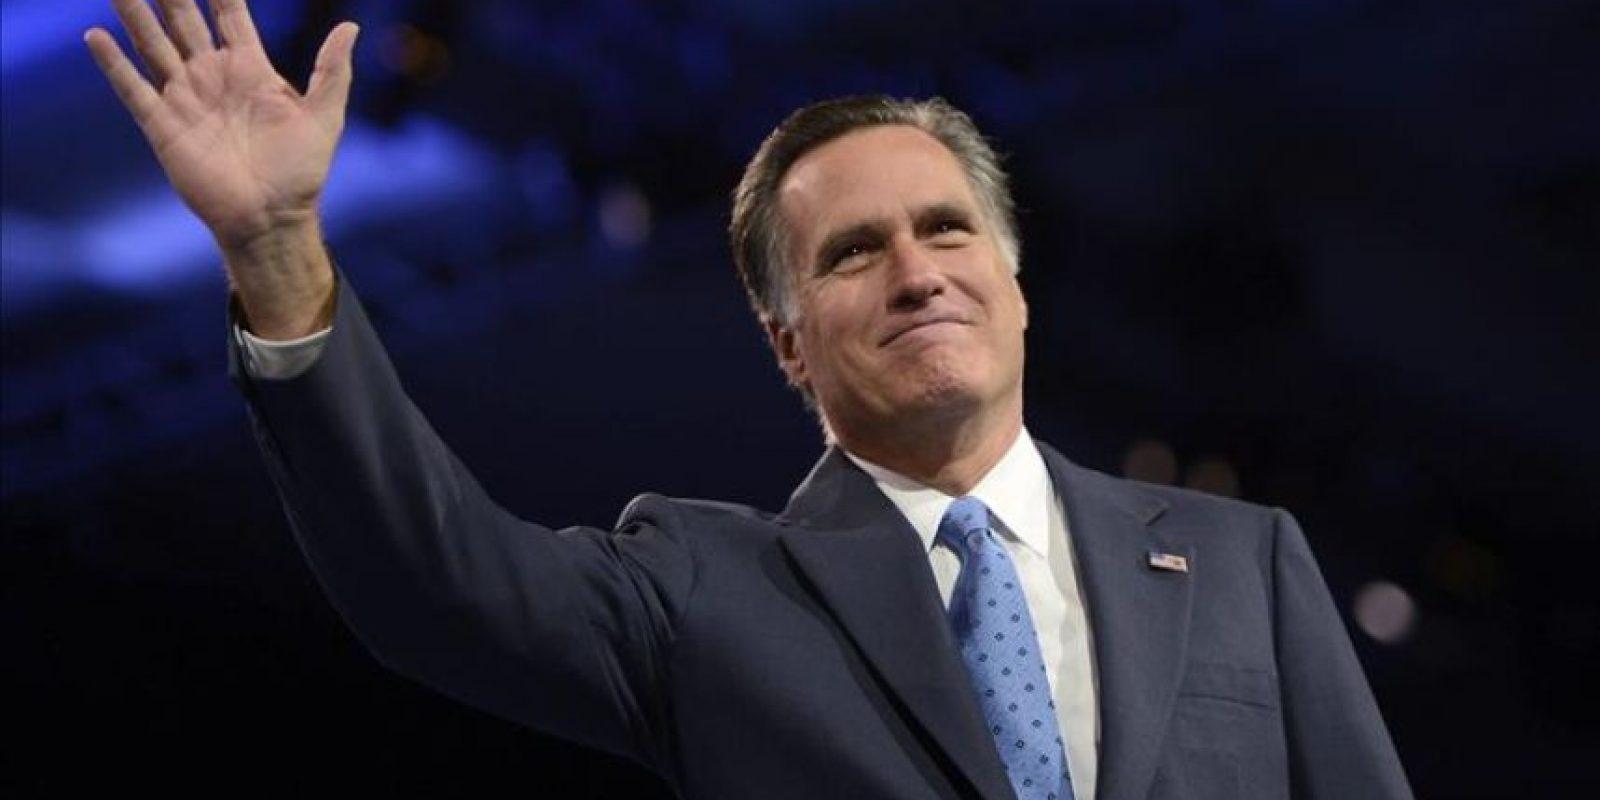 El exgobernador de Massachussetts Mitt Romney. EFE/Archivo